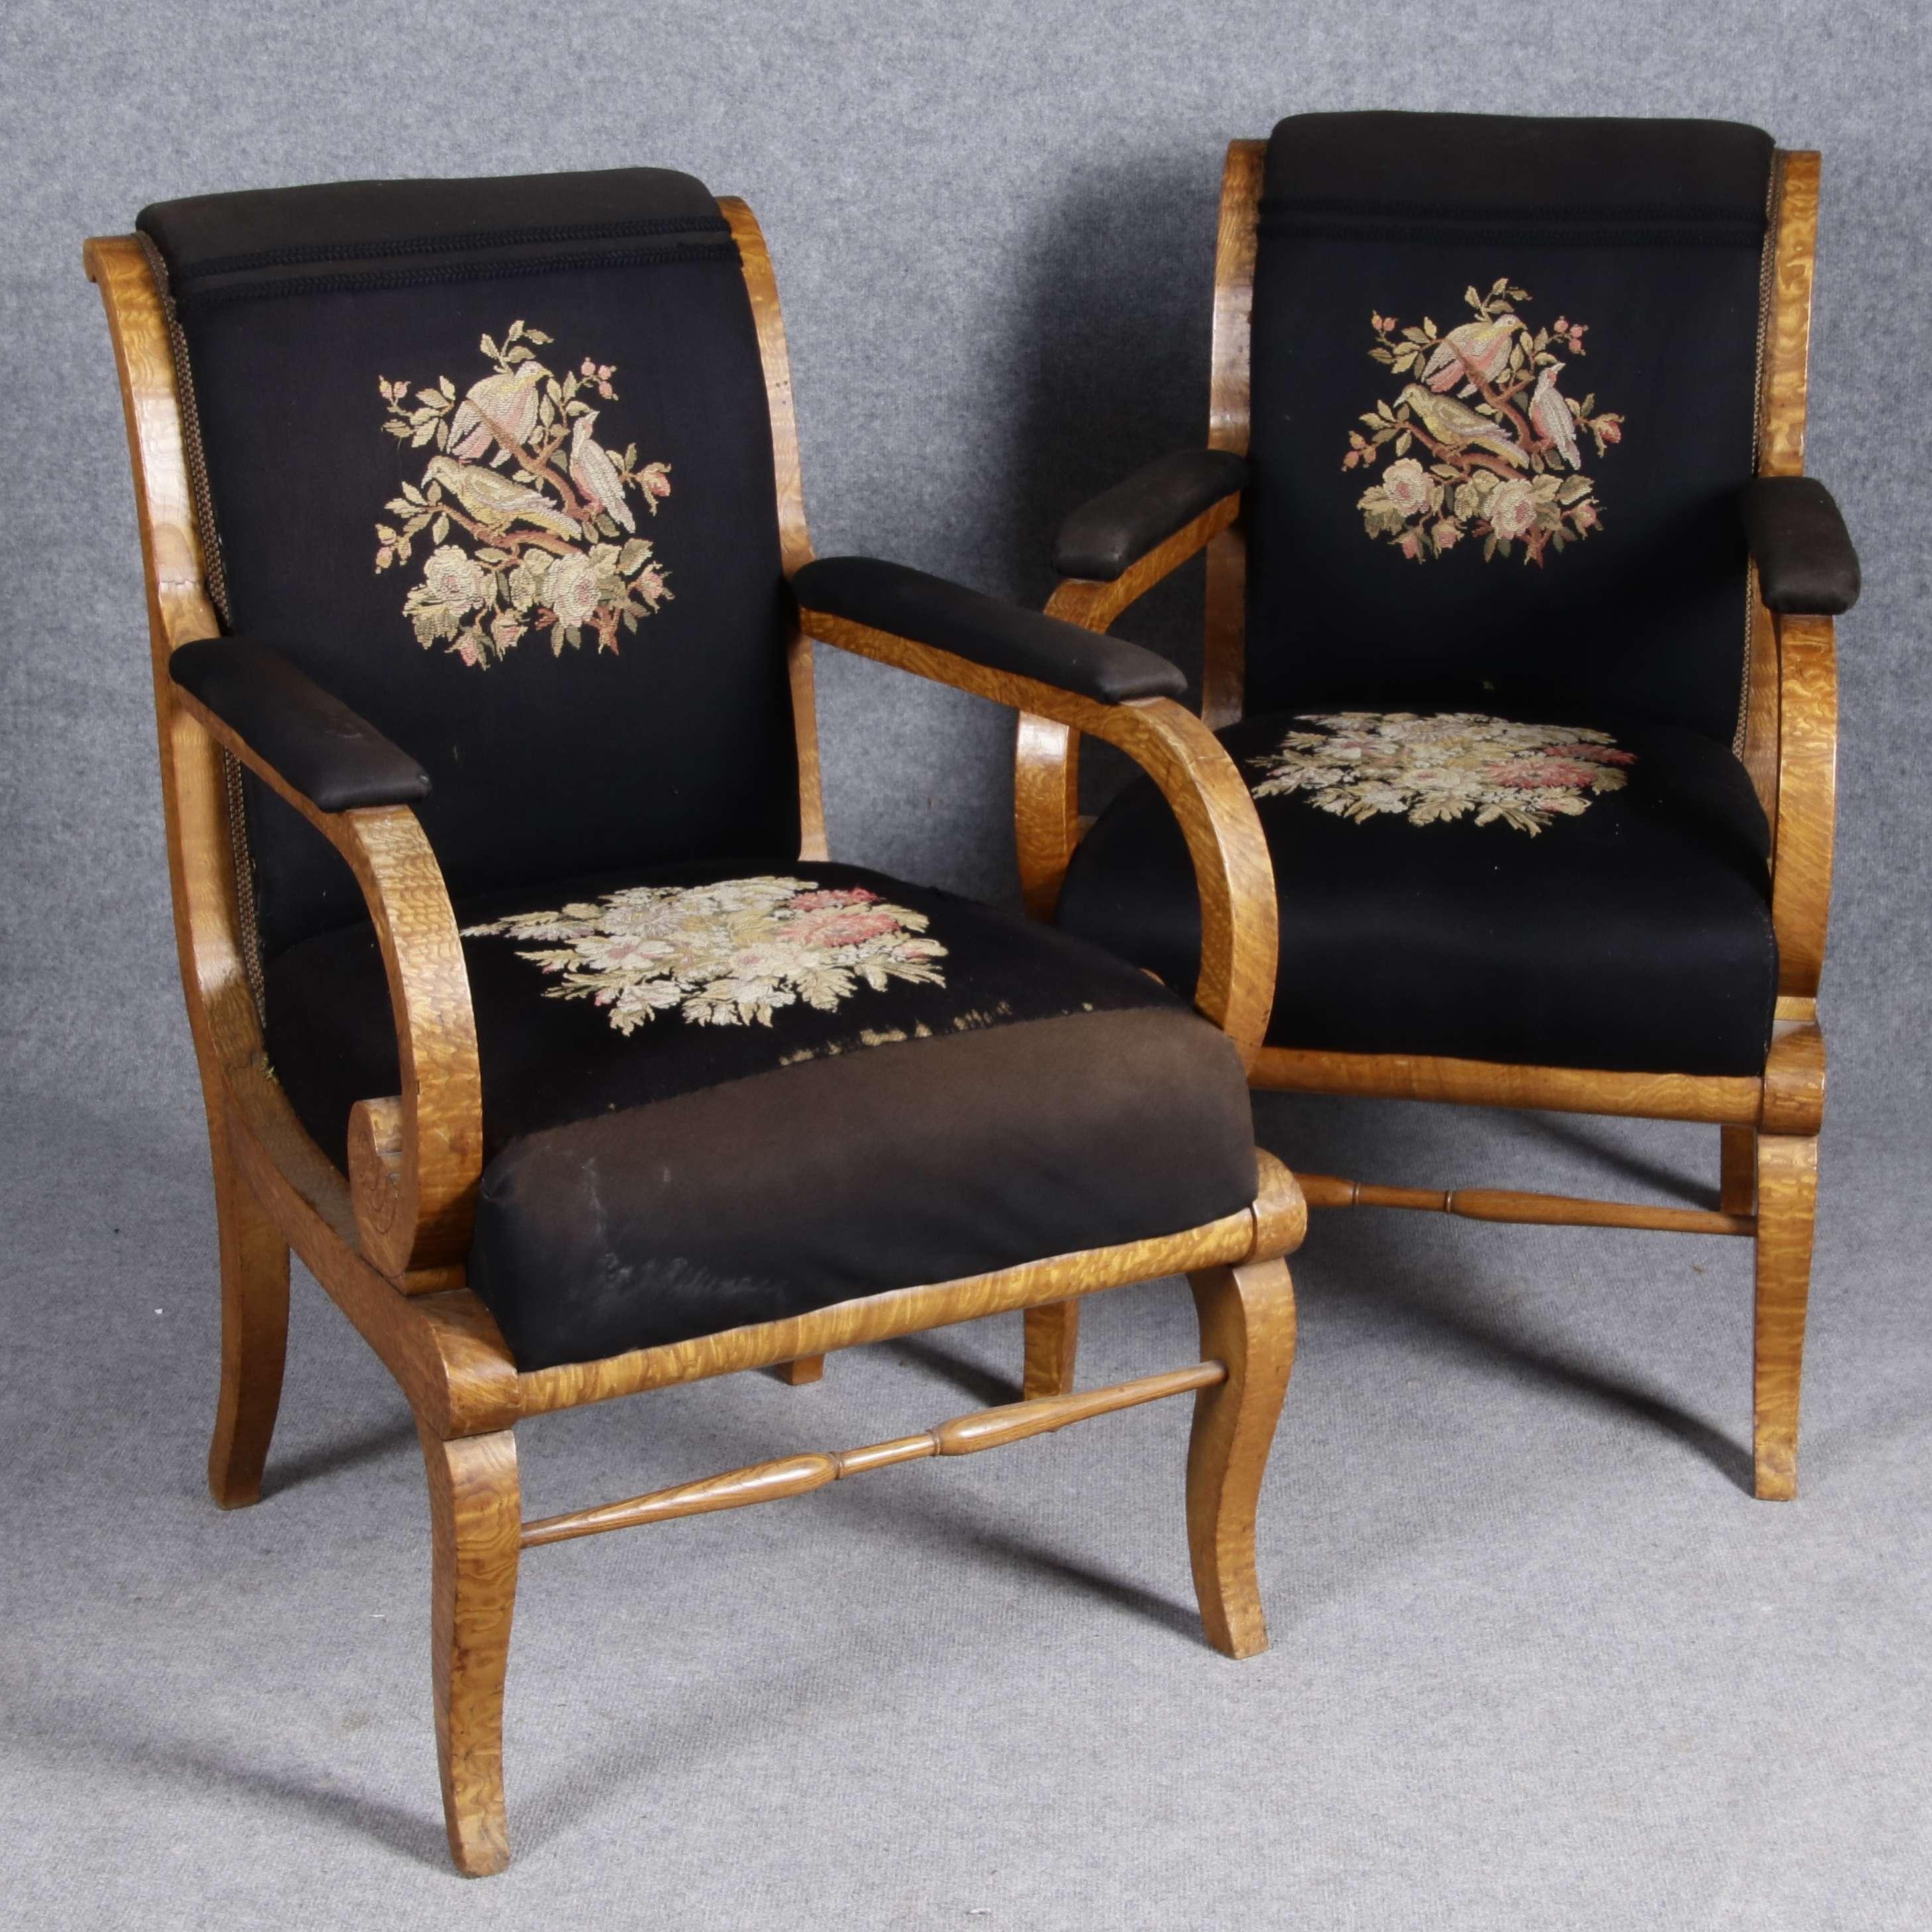 zwei biedermeier sessel um 1820 ebay. Black Bedroom Furniture Sets. Home Design Ideas